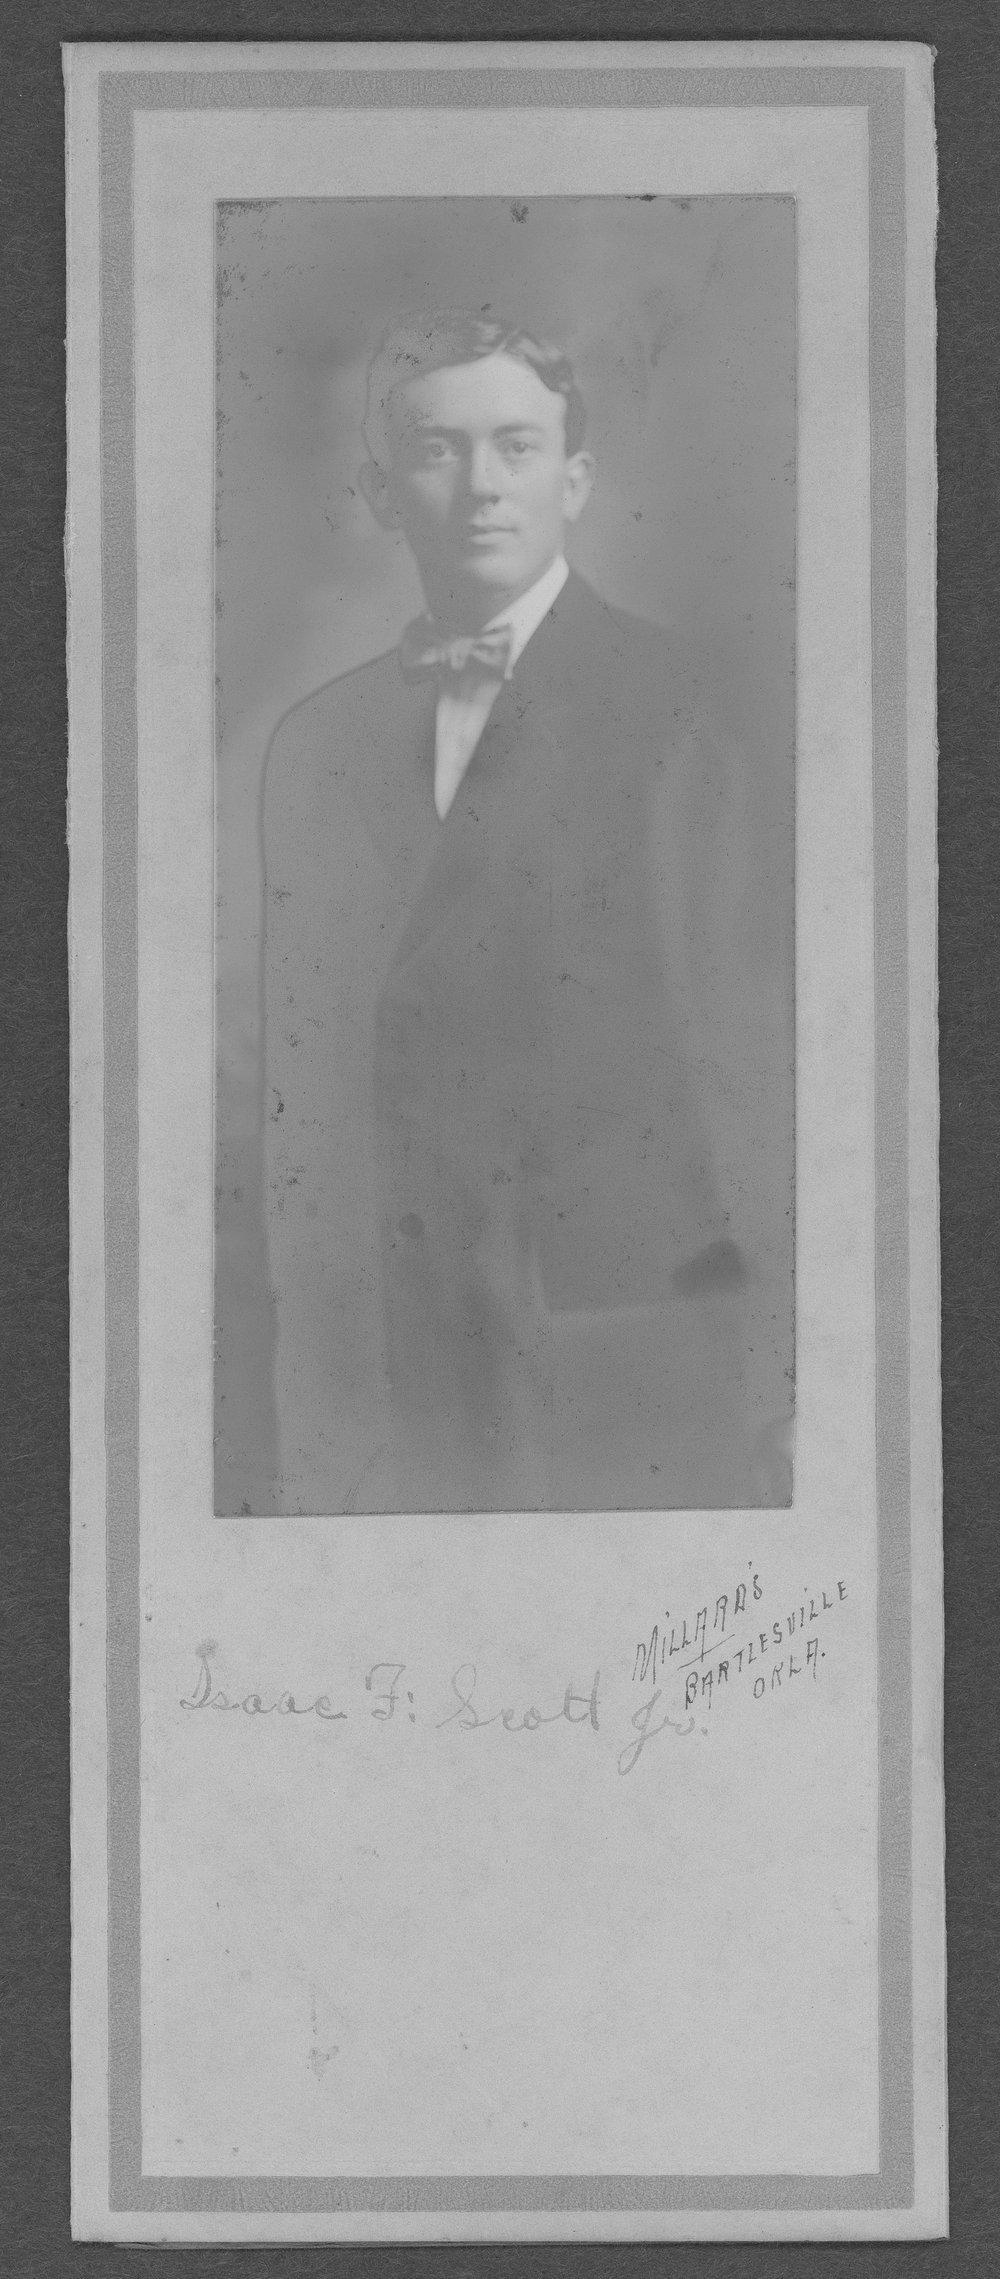 Isaac Frantz Scott, World War I soldier - 2